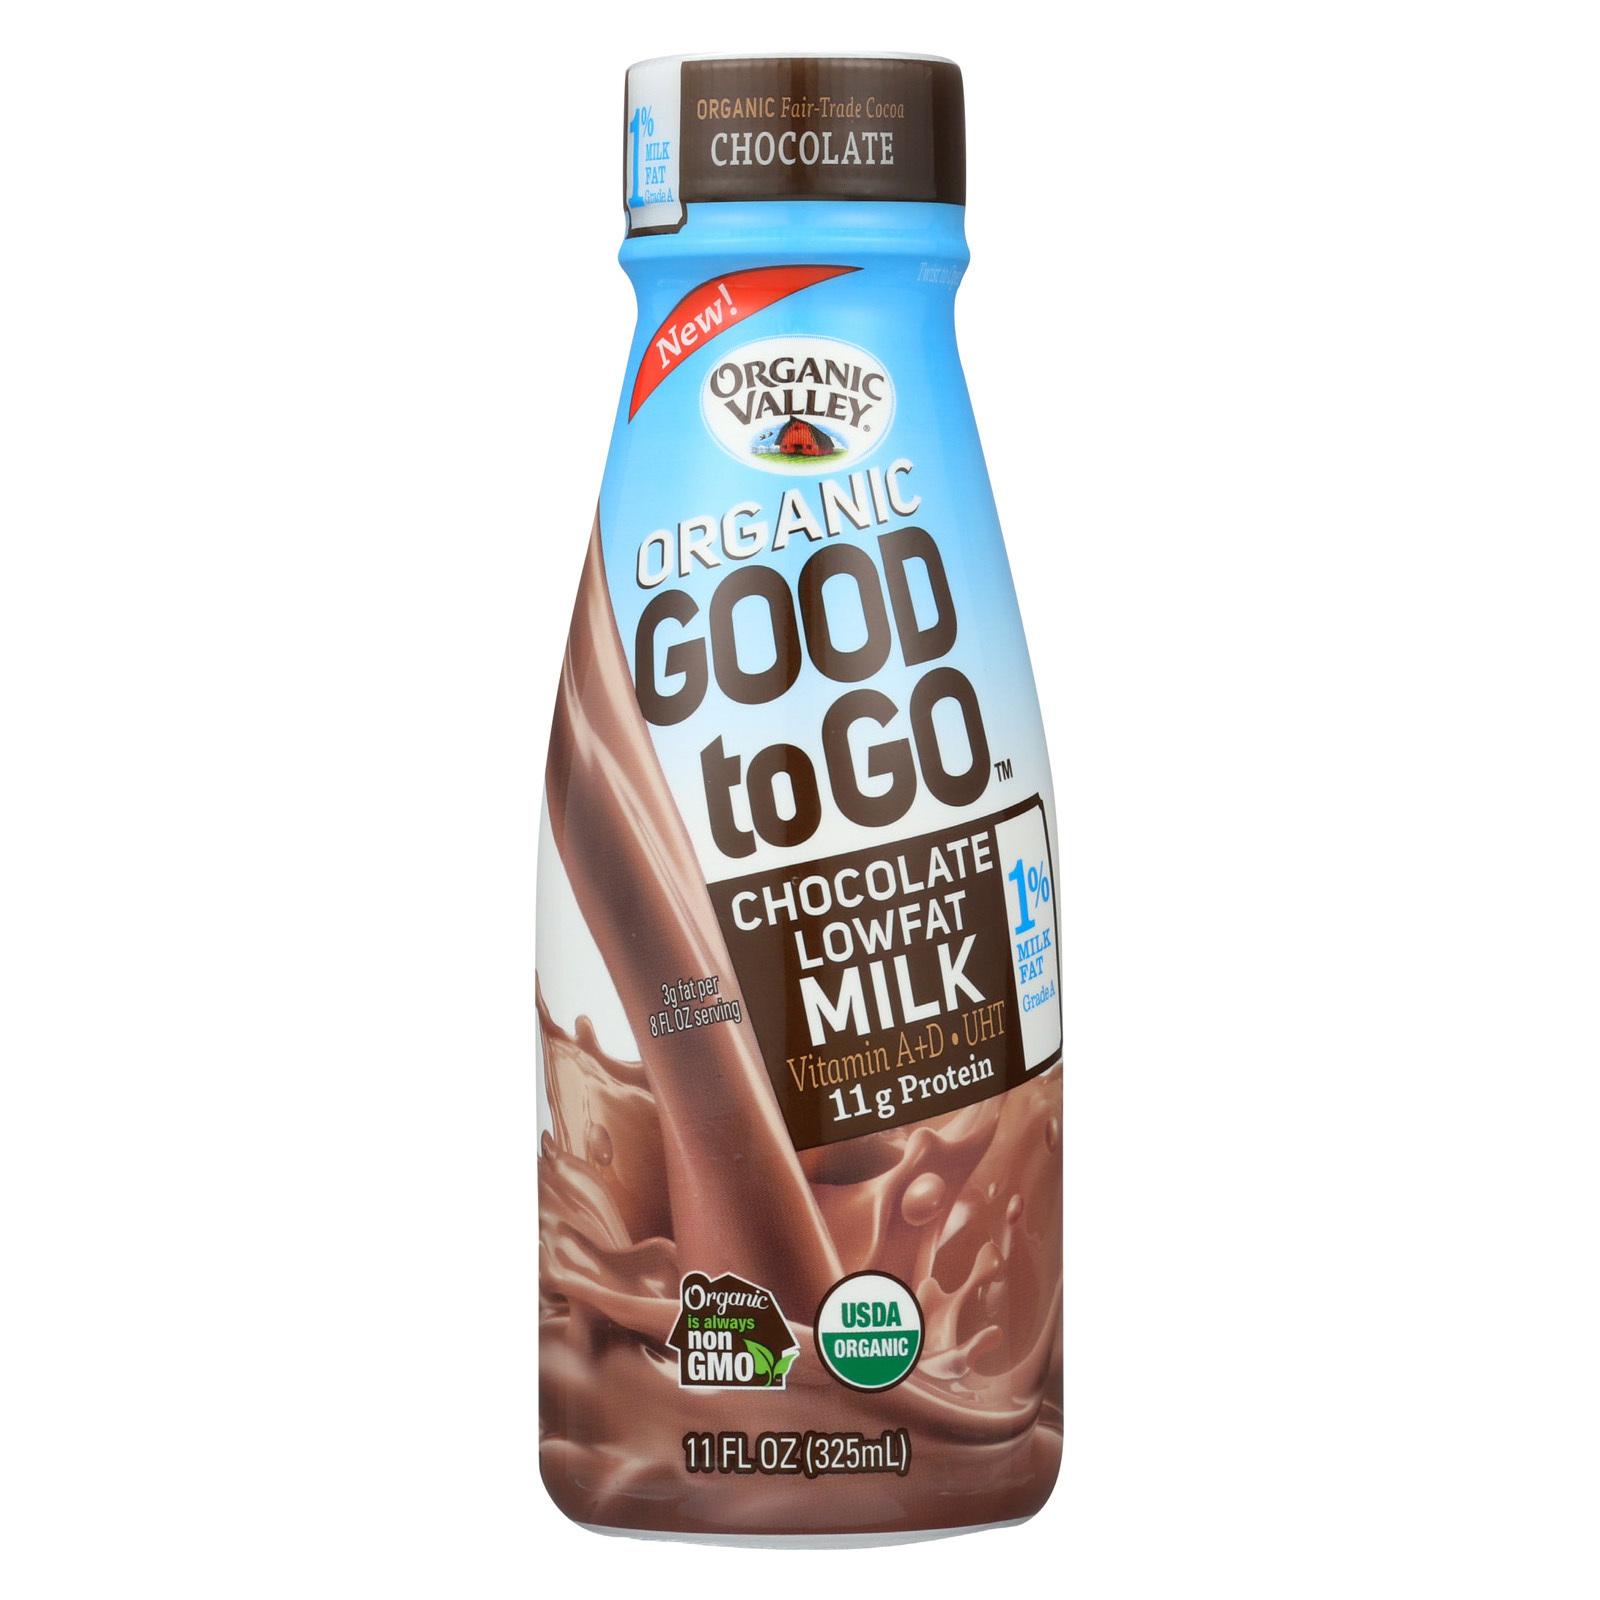 Organic Valley Organic Milk - Good To Go Chocolate Low Fat - Case of 12 - 11 fl oz